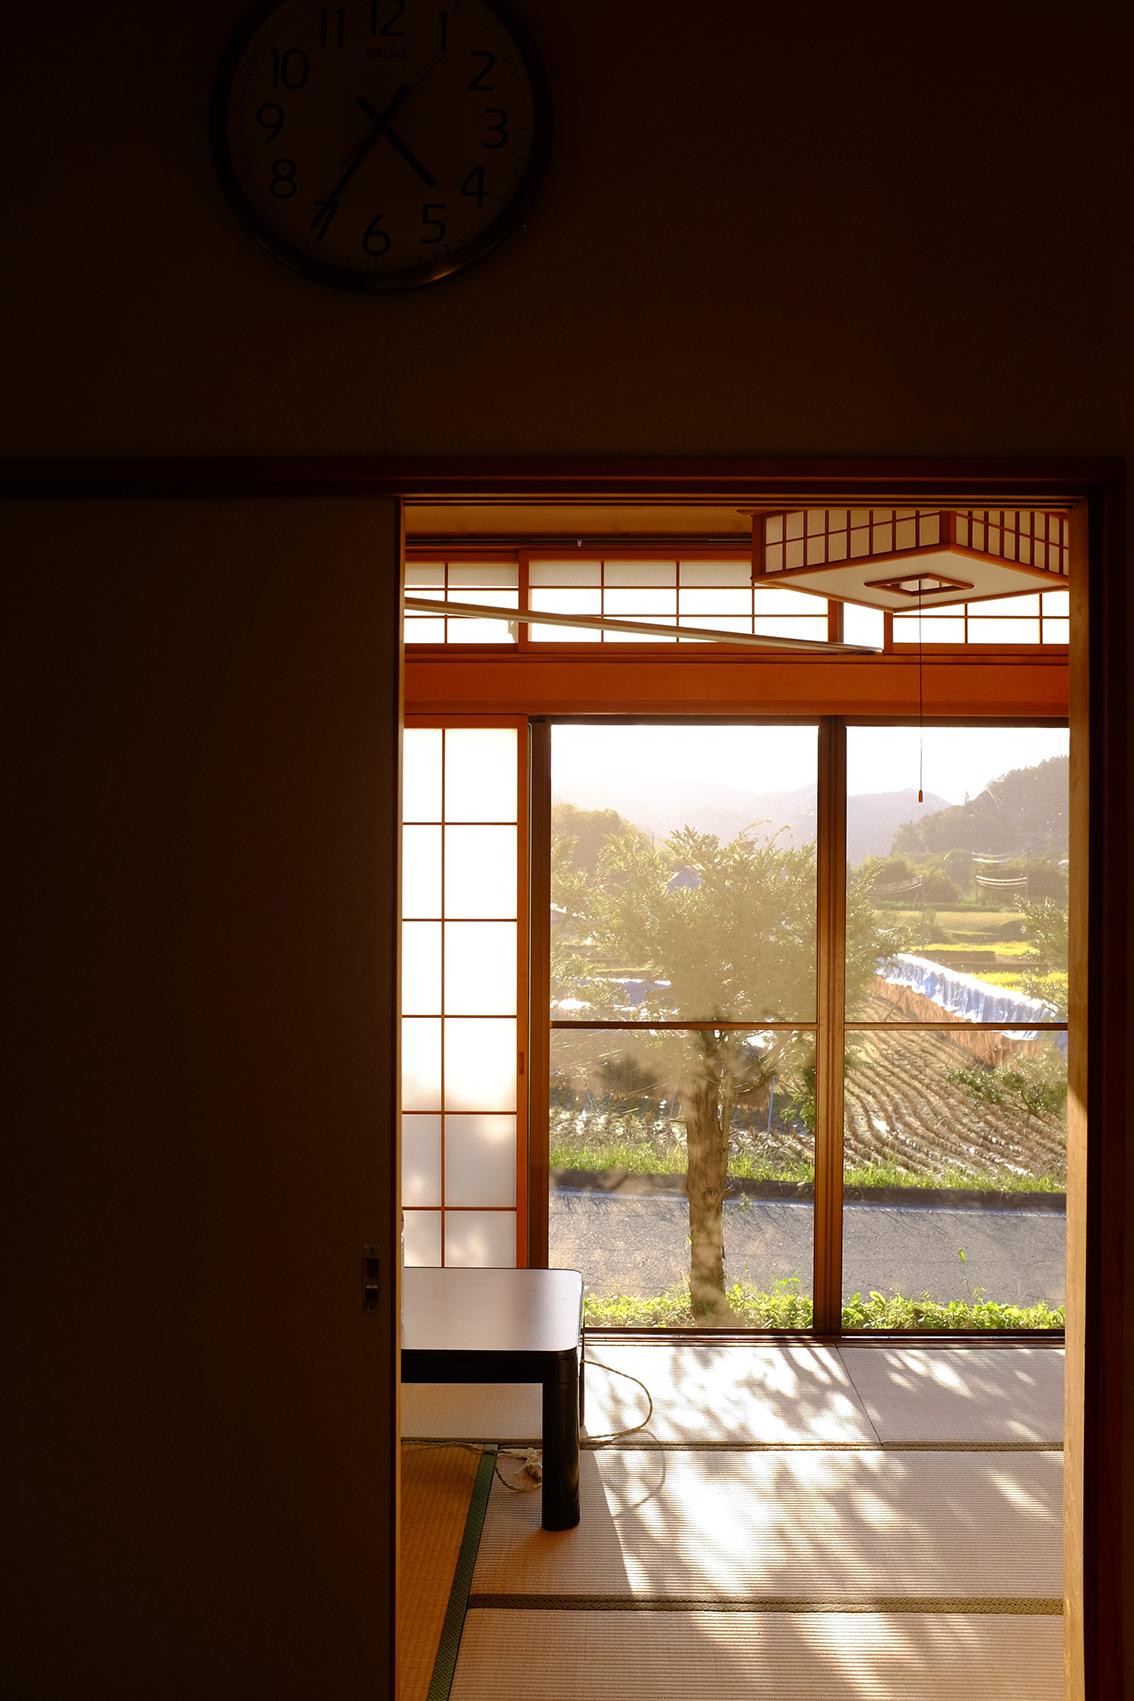 Sunset in Tatami room